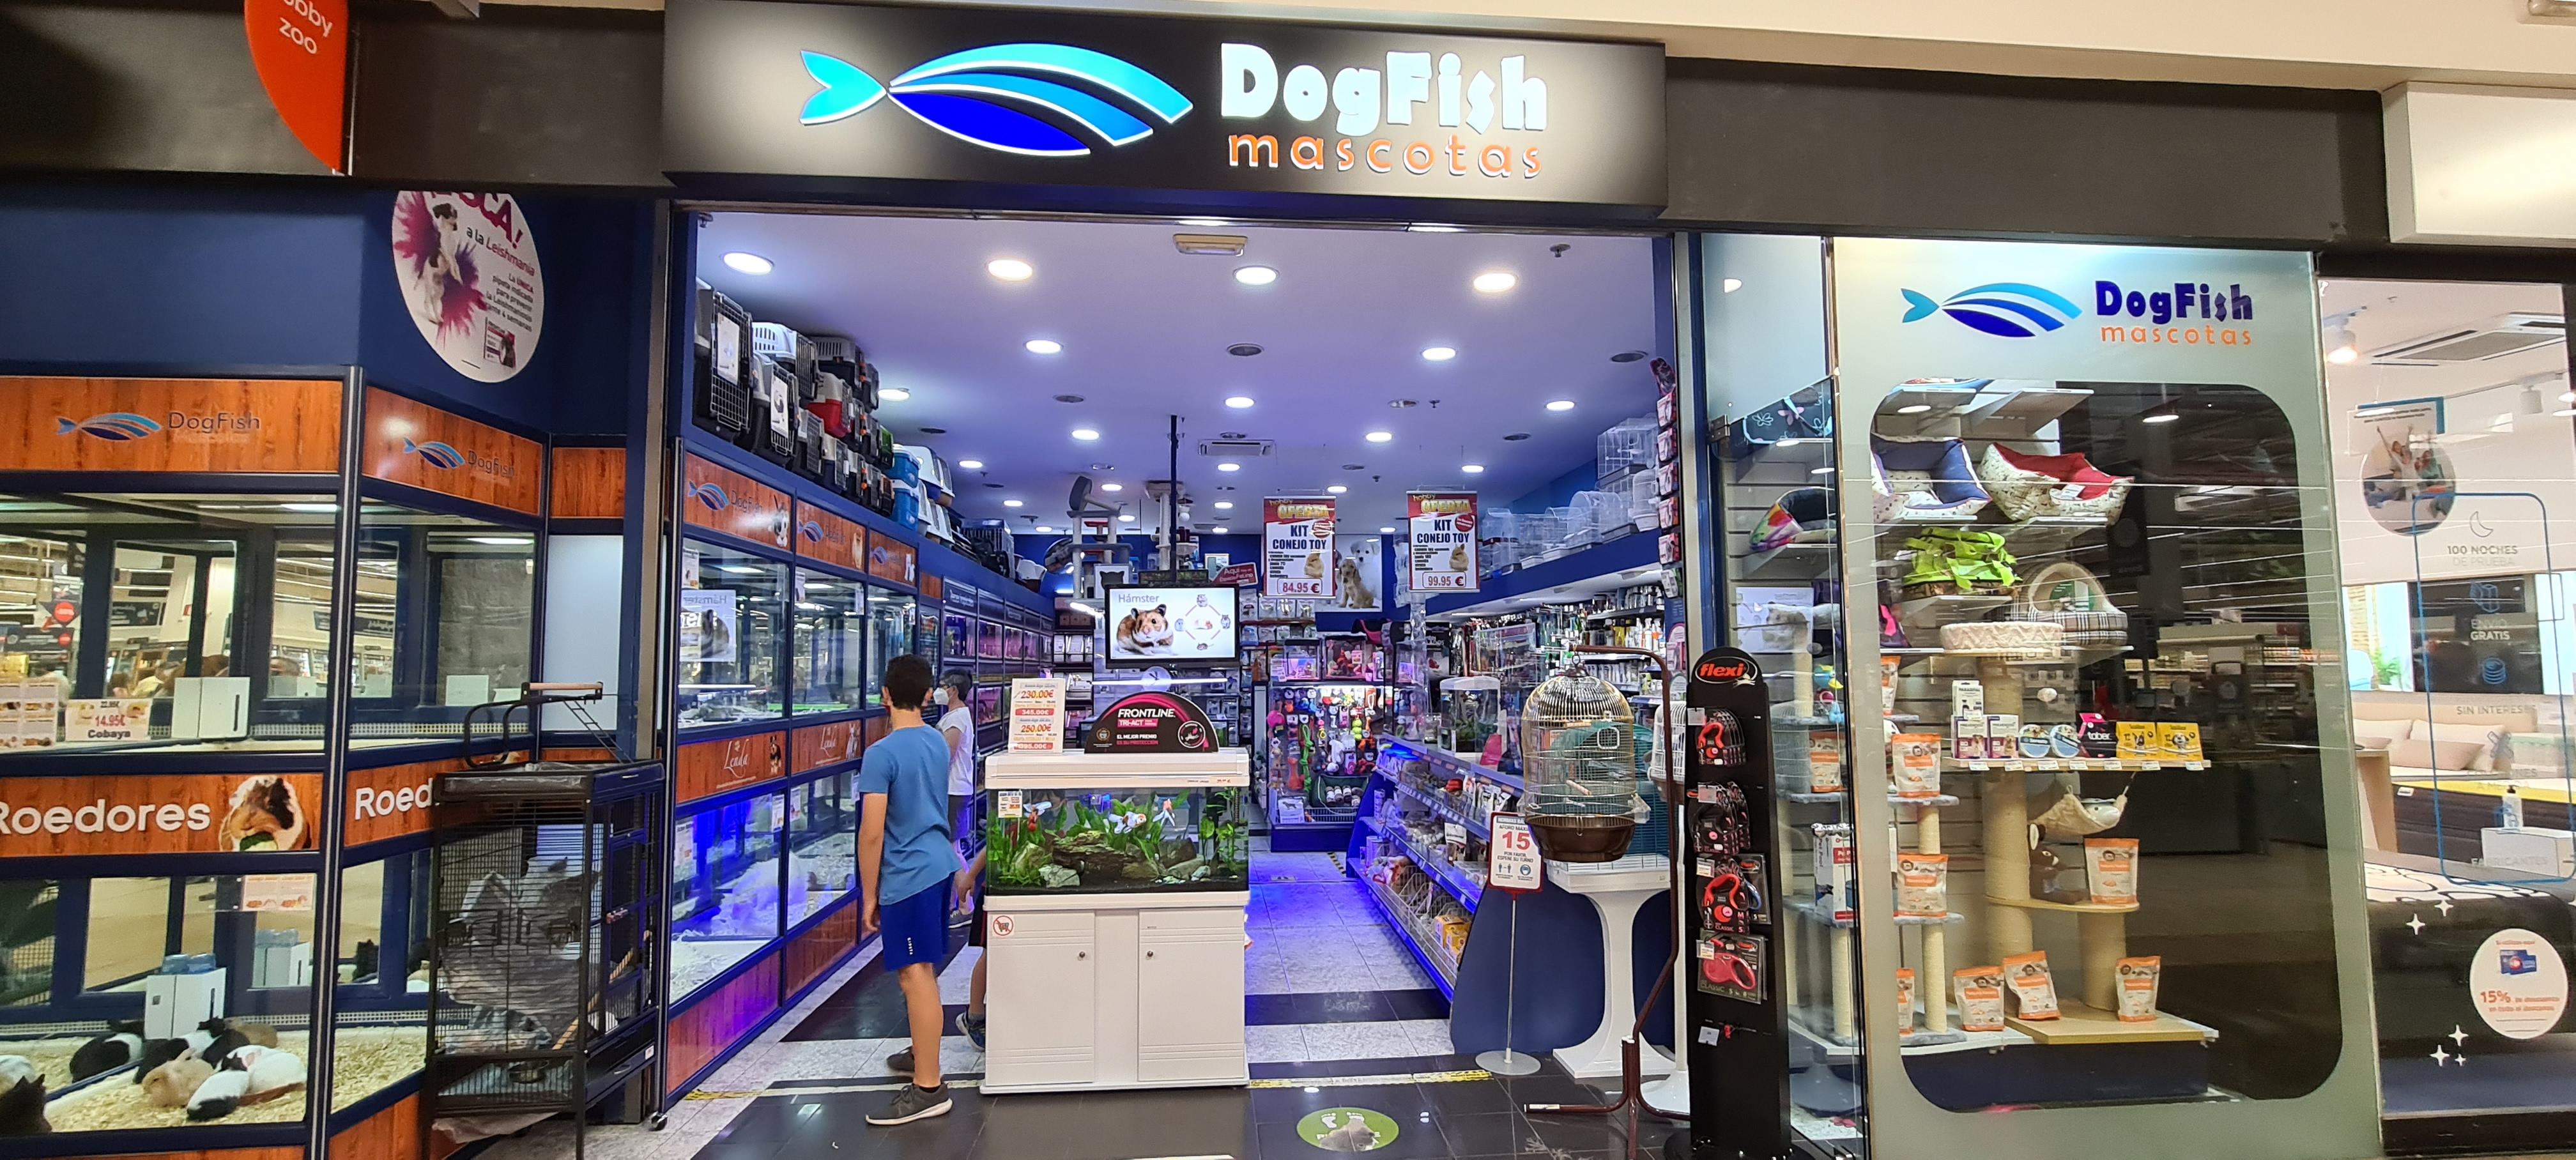 DogFish Mascotas